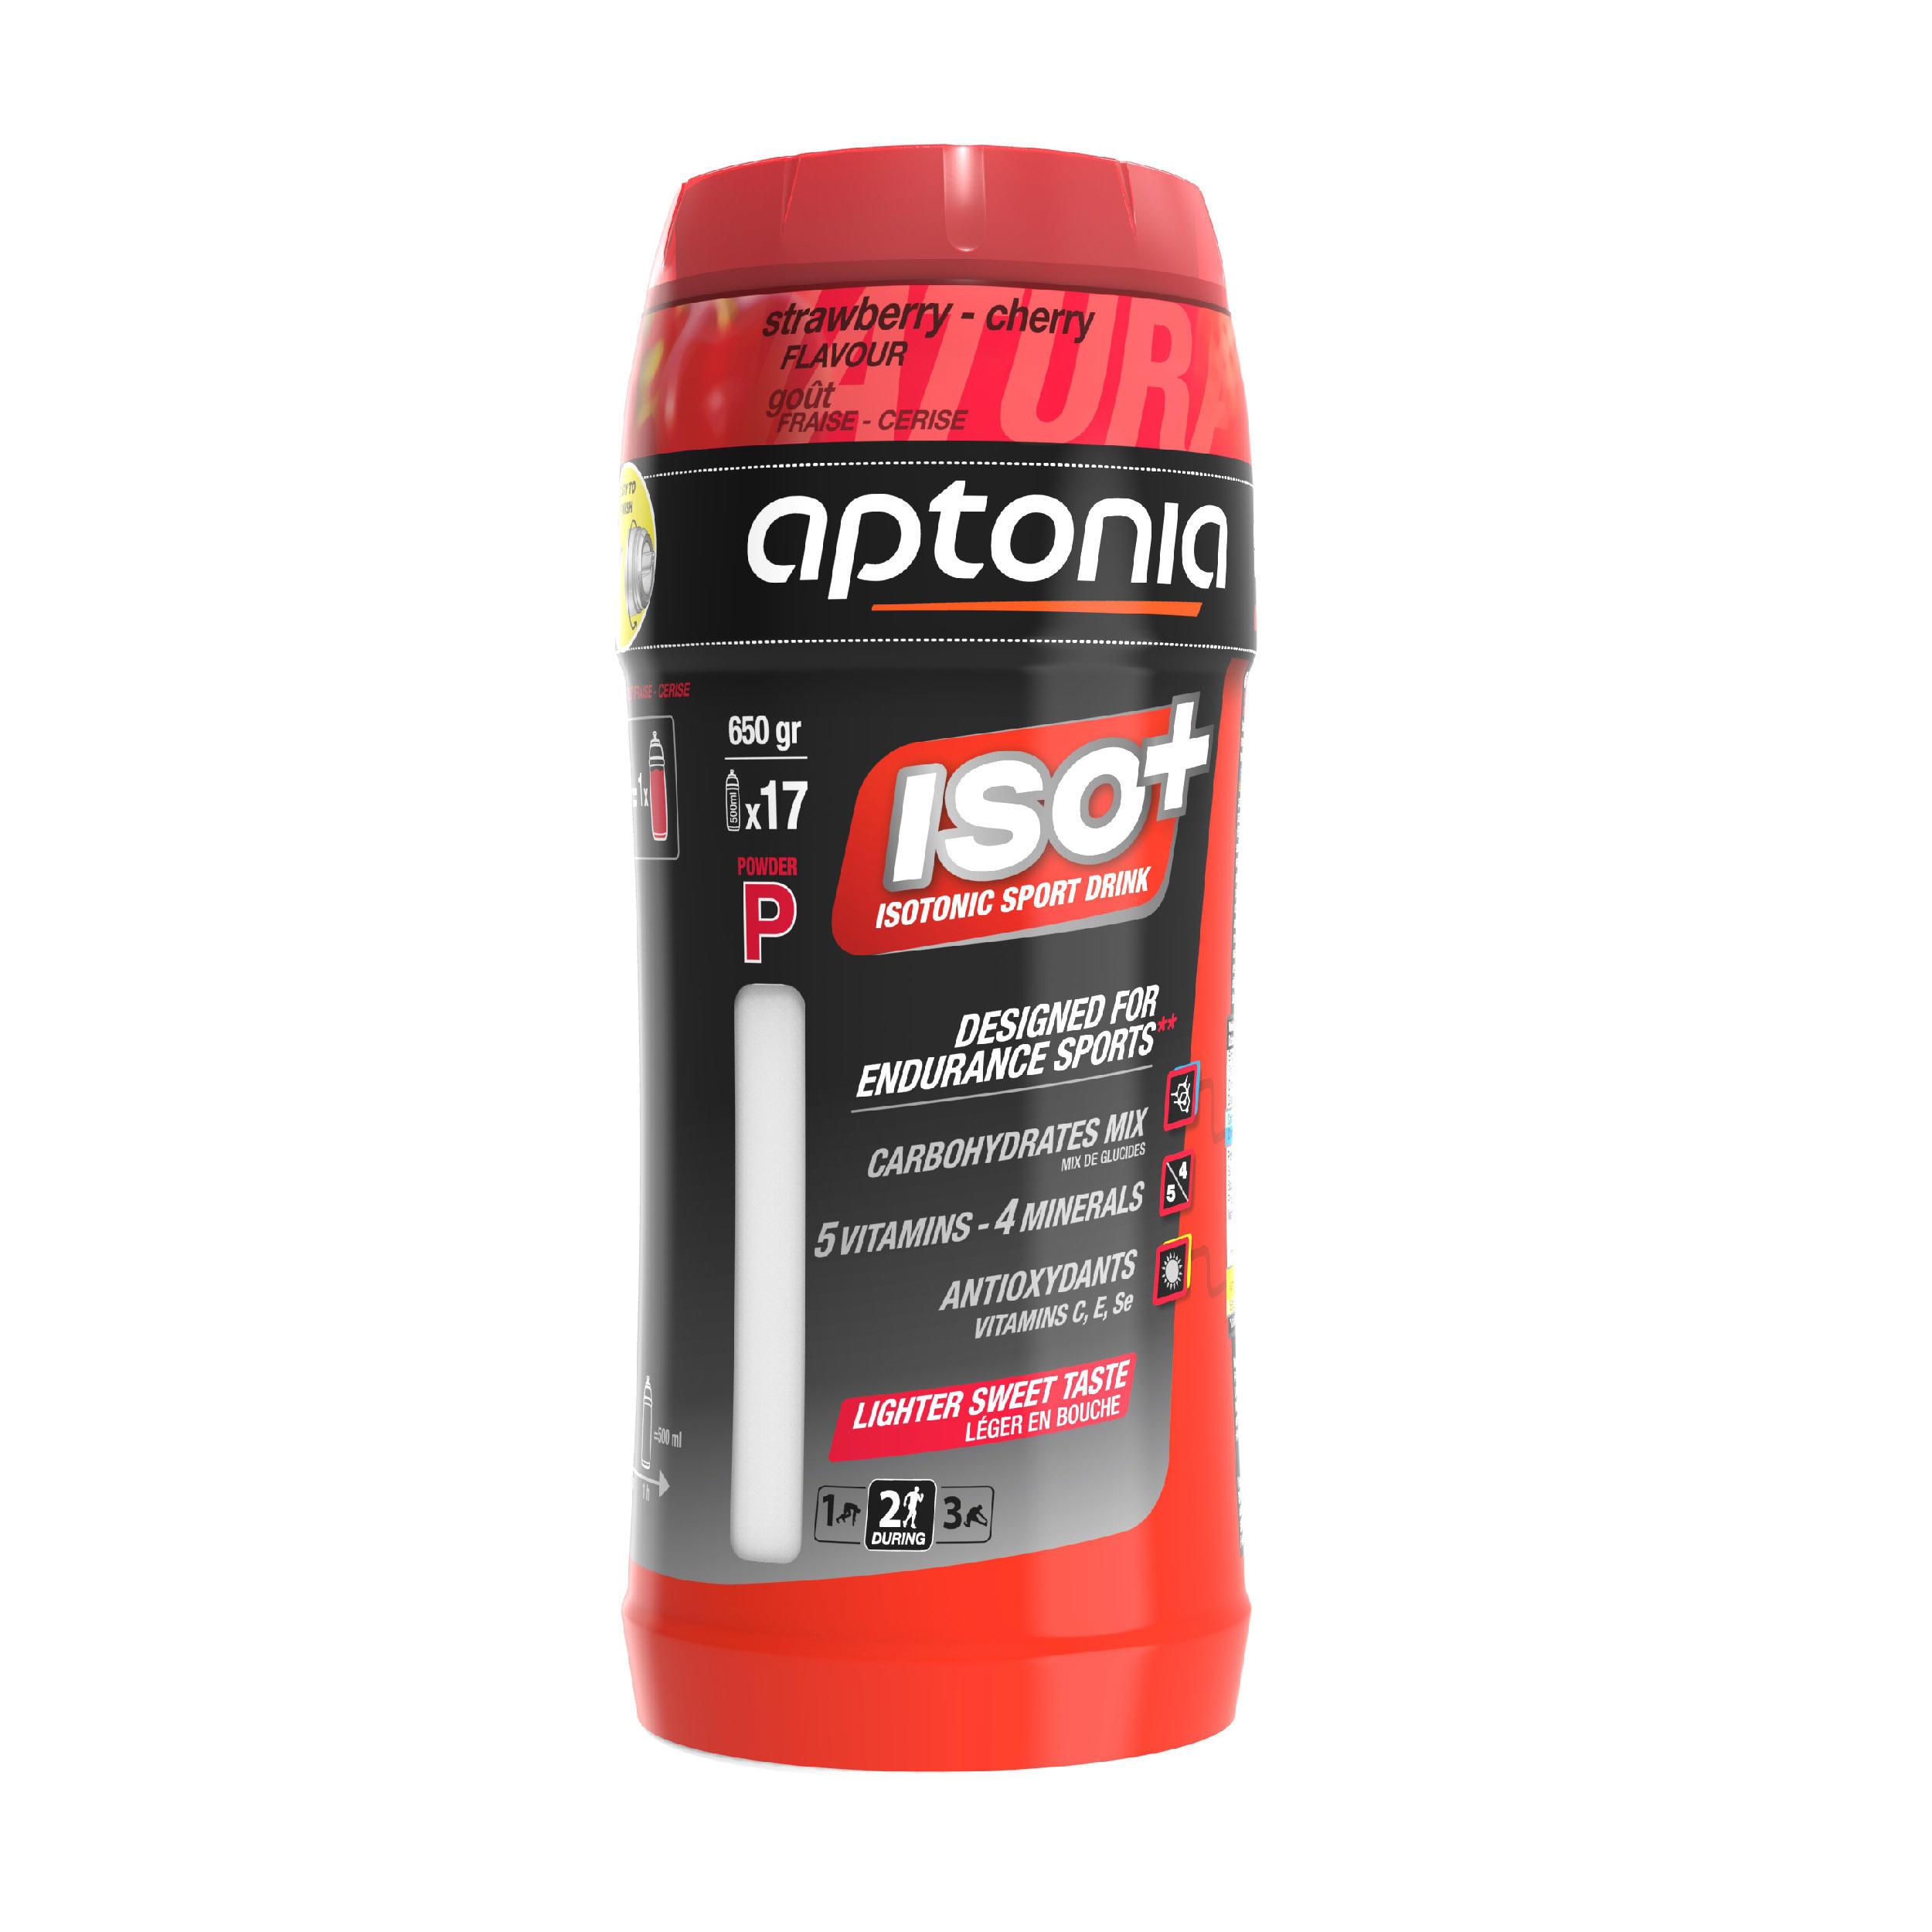 Iso-Getränkepulver ISO+ Erdbeere/Kirsche 650 g